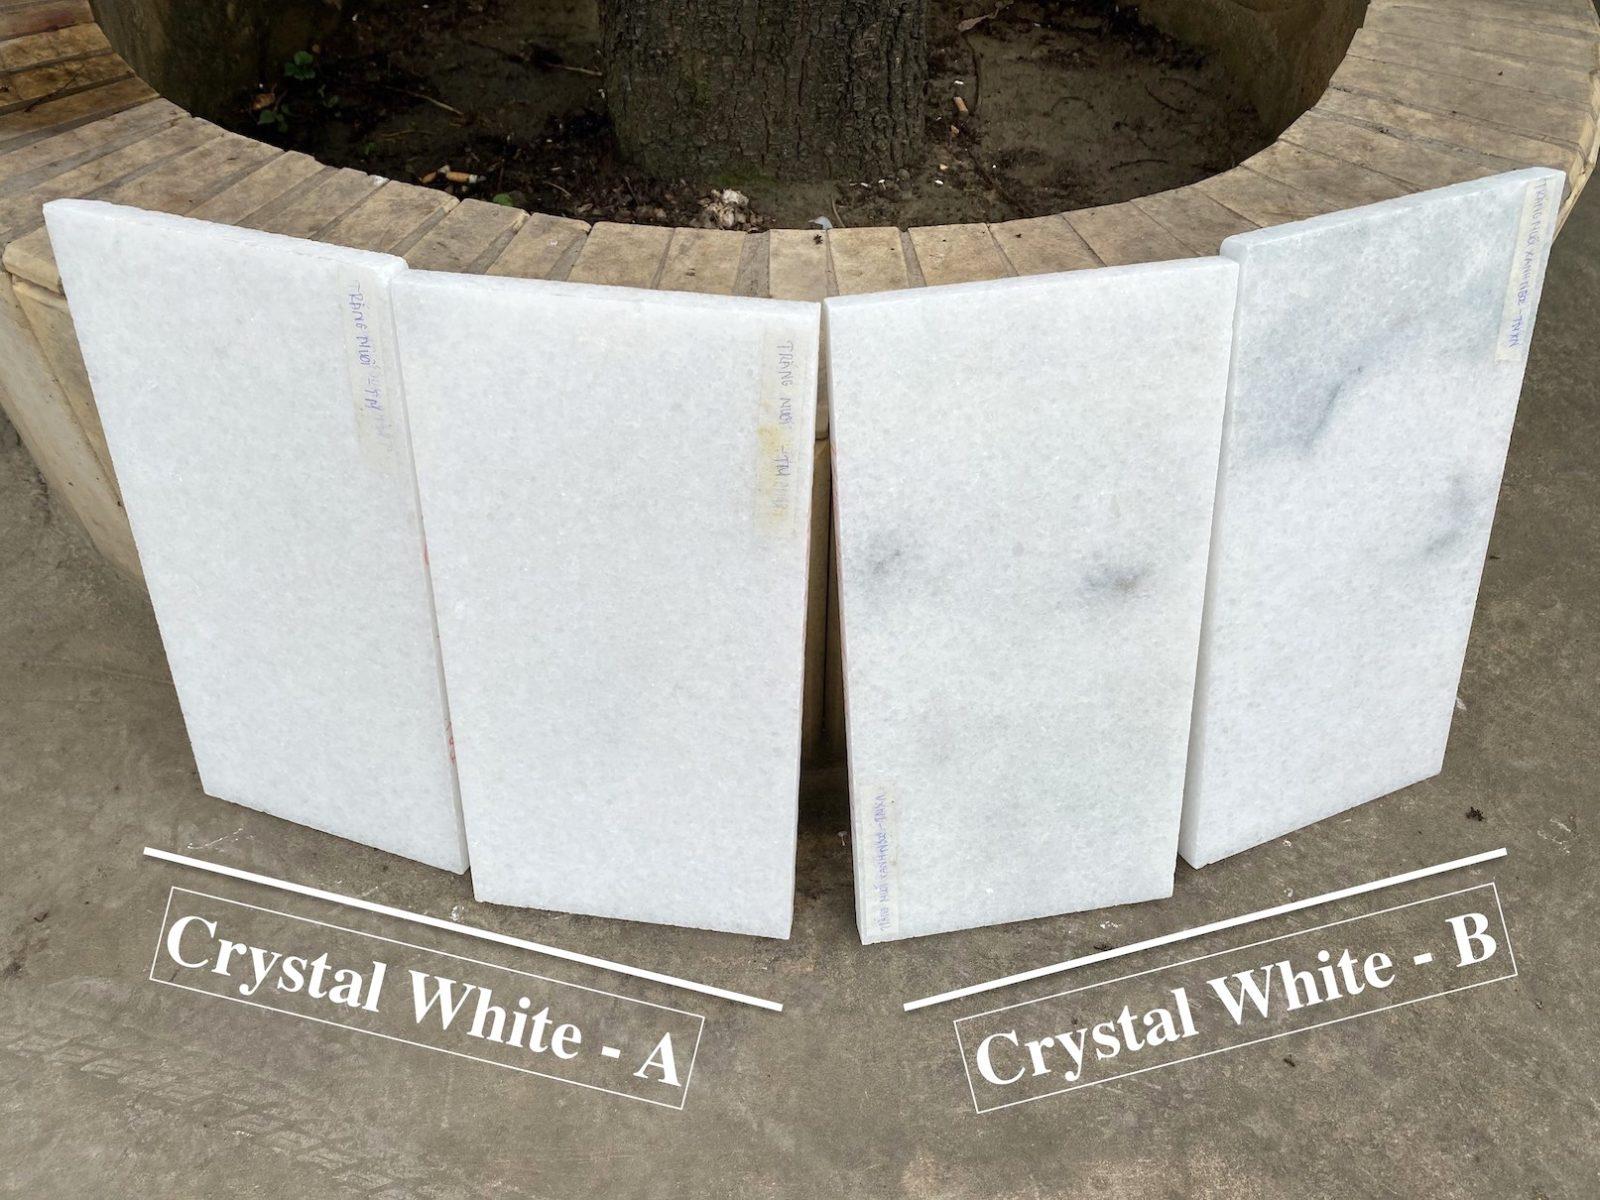 Crystal White фото 5f990dc1d2de5